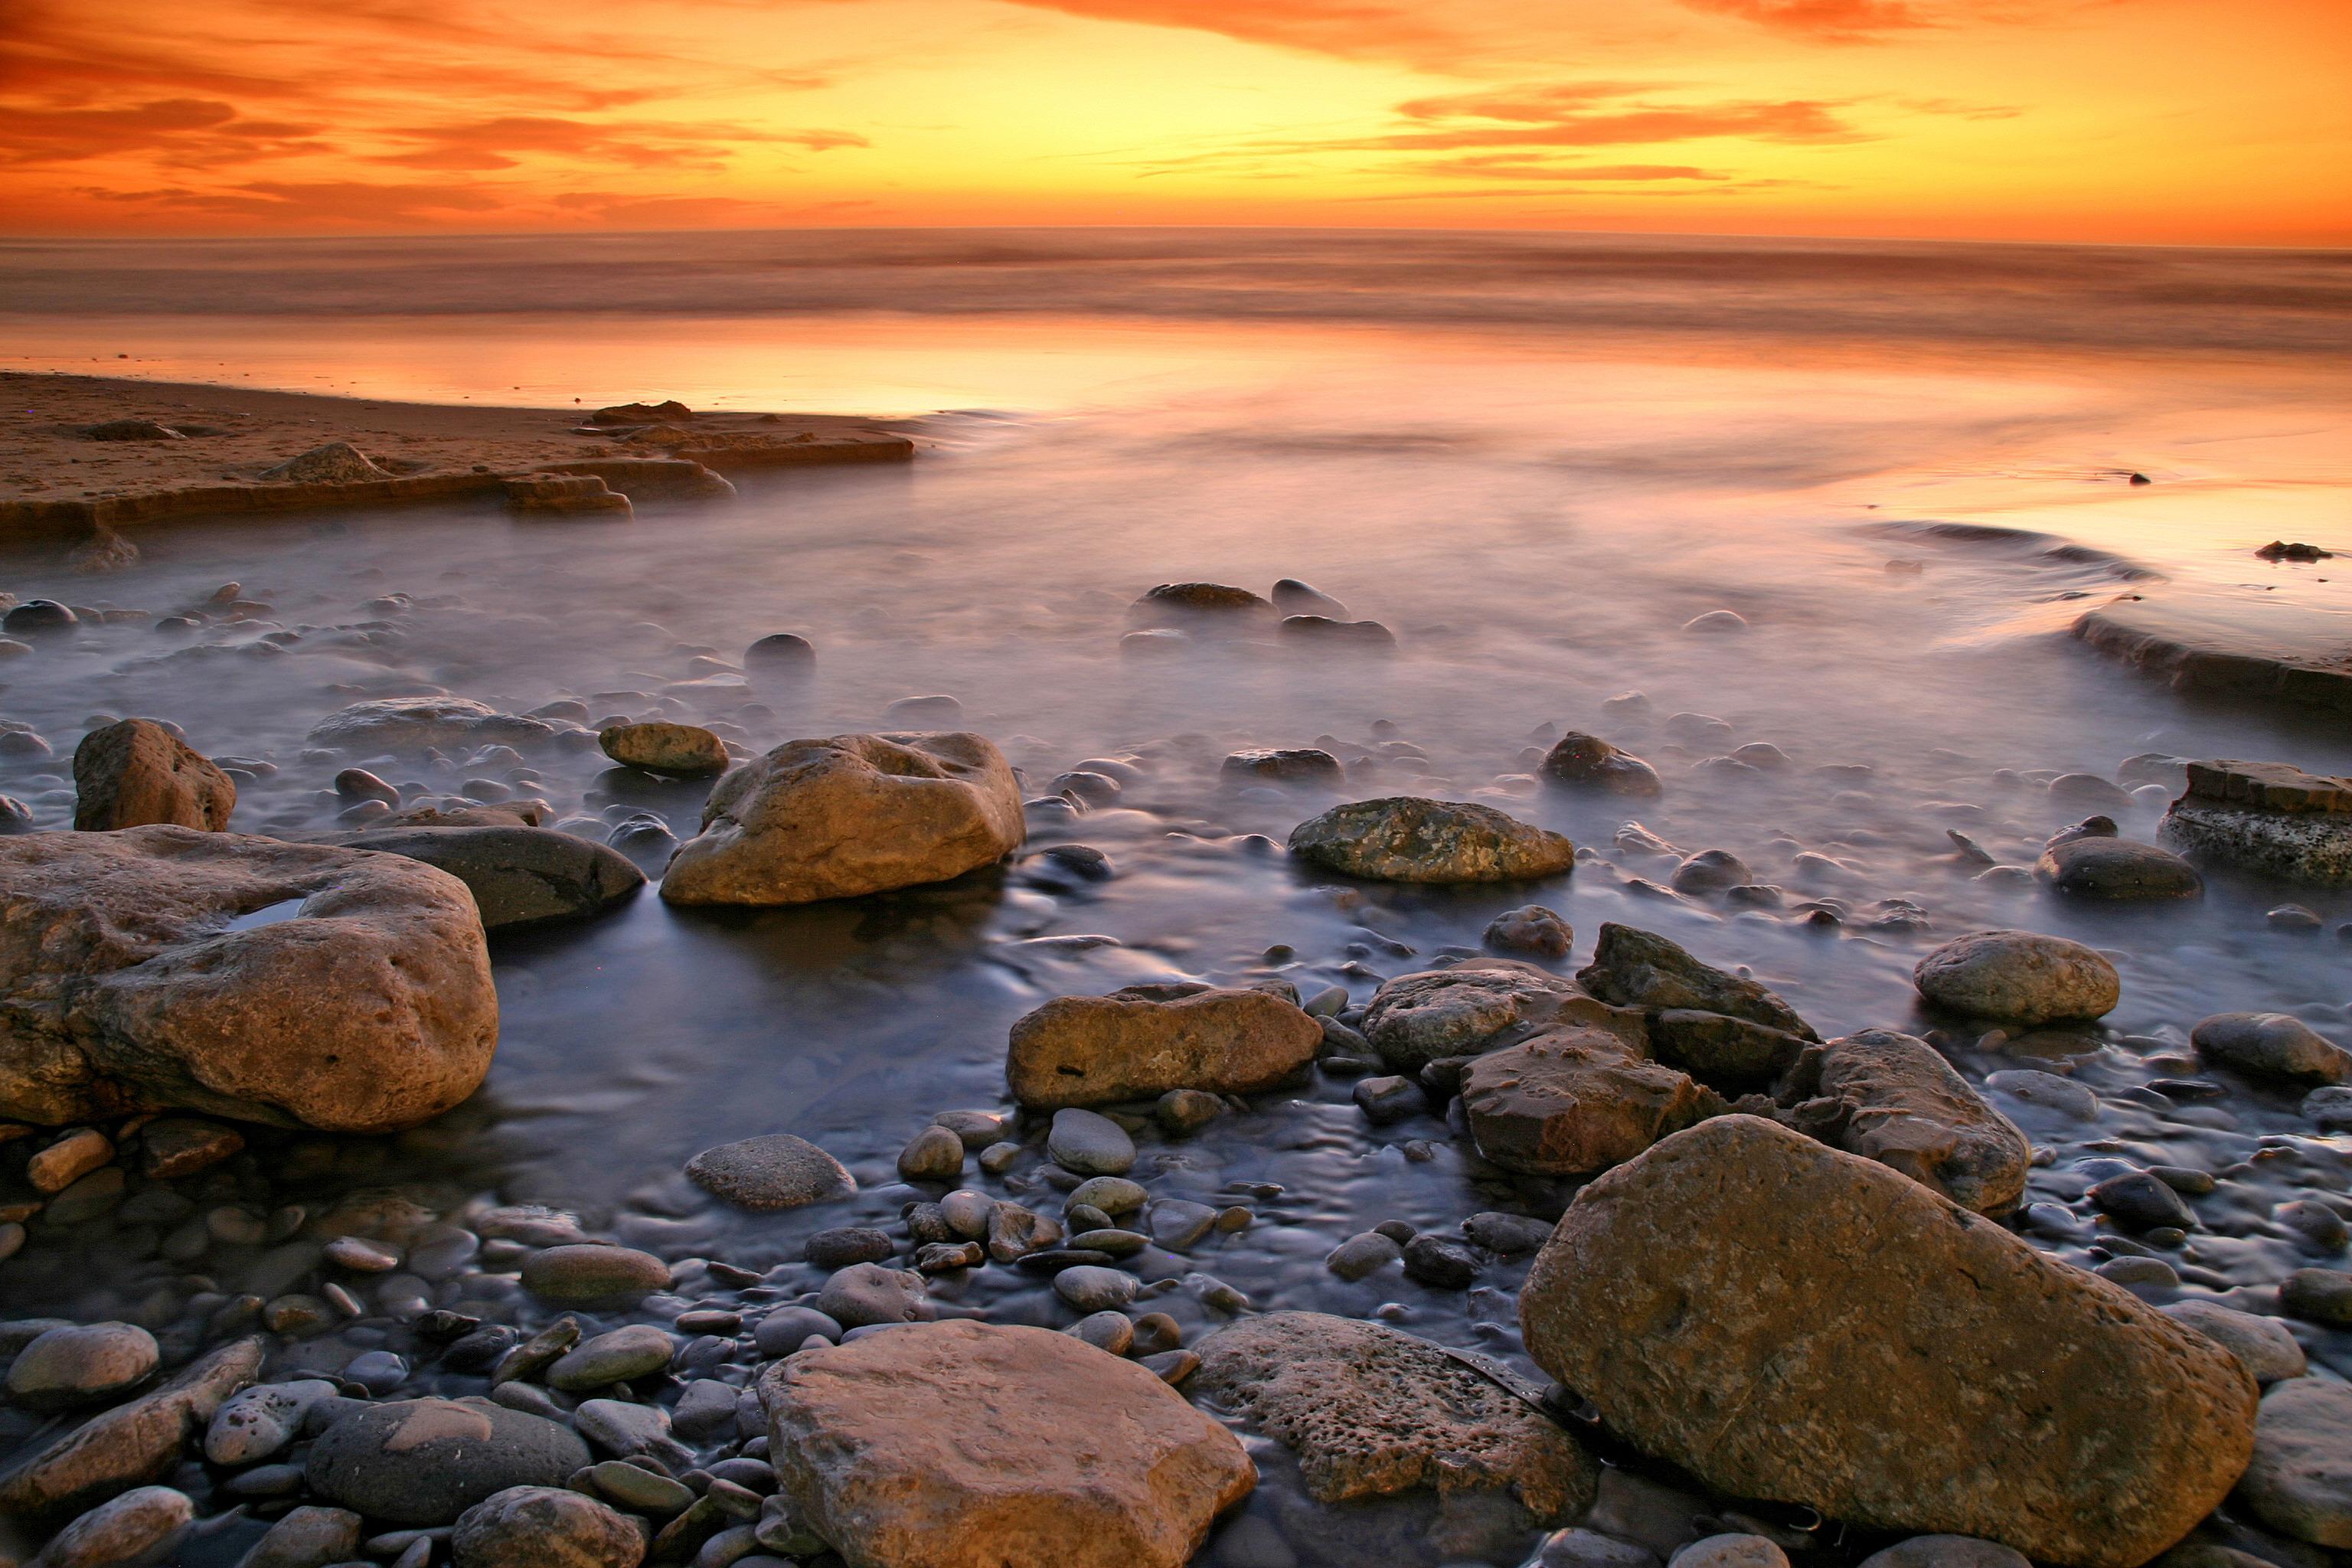 закат камень берег море sunset stone shore sea  № 1023669  скачать